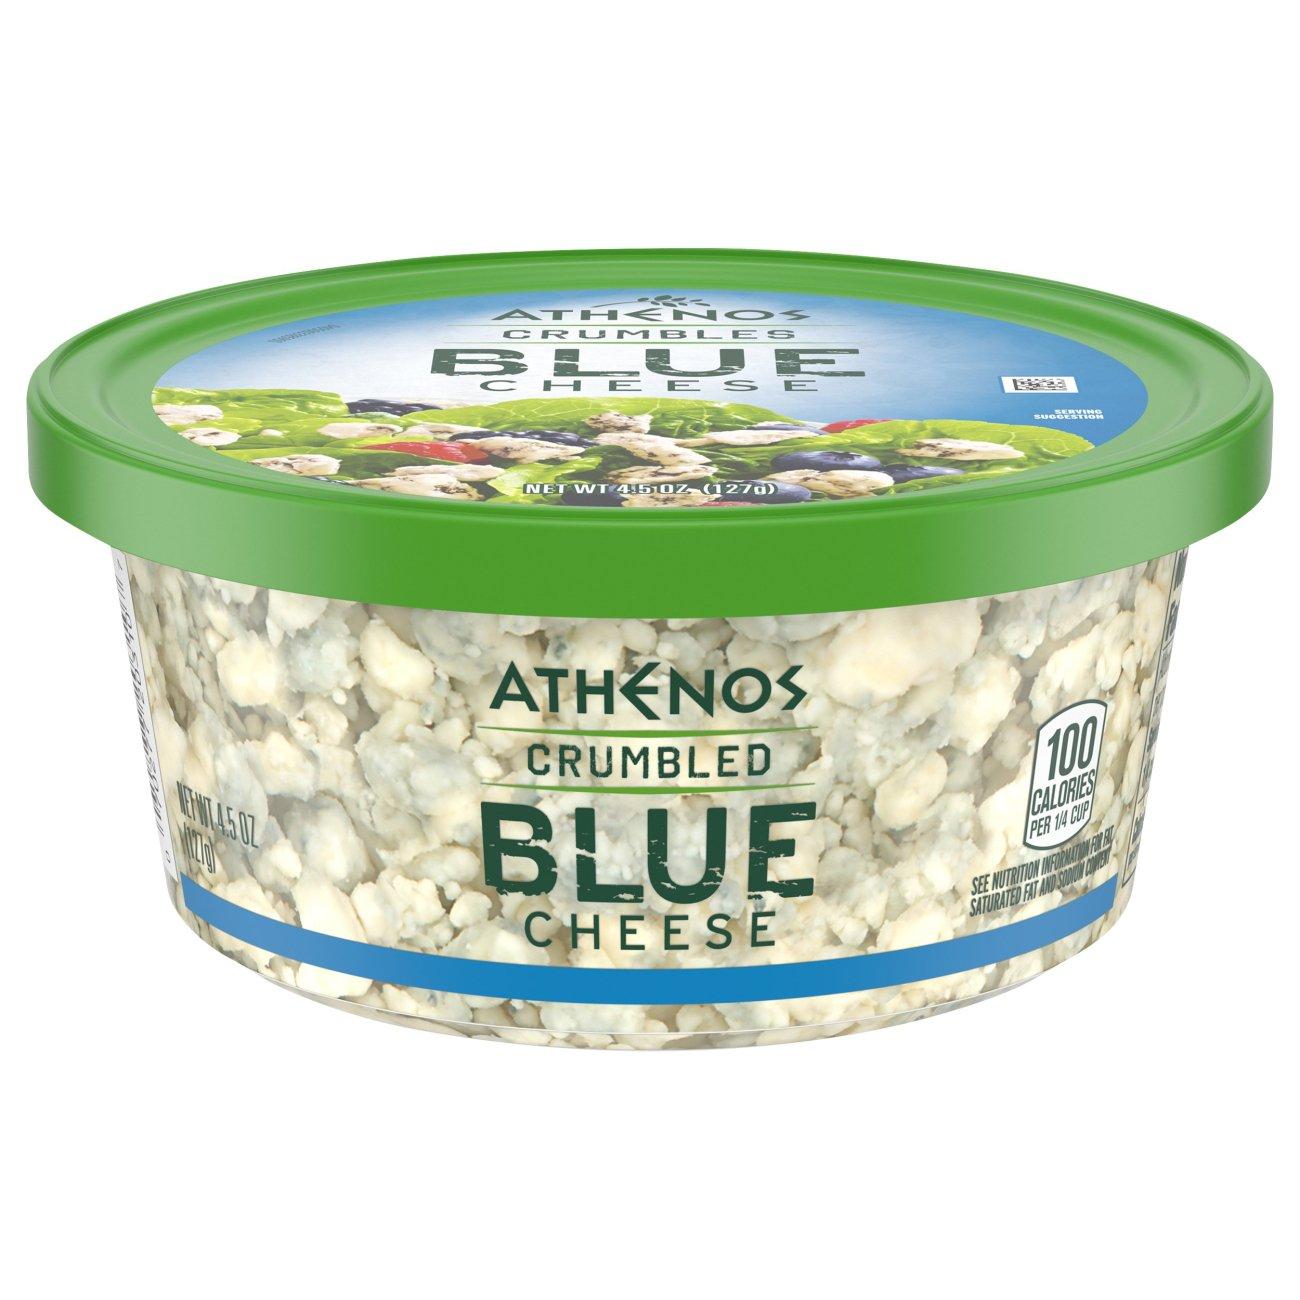 Athenos Crumbled Blue Cheese - Shop Cheese at H-E-B